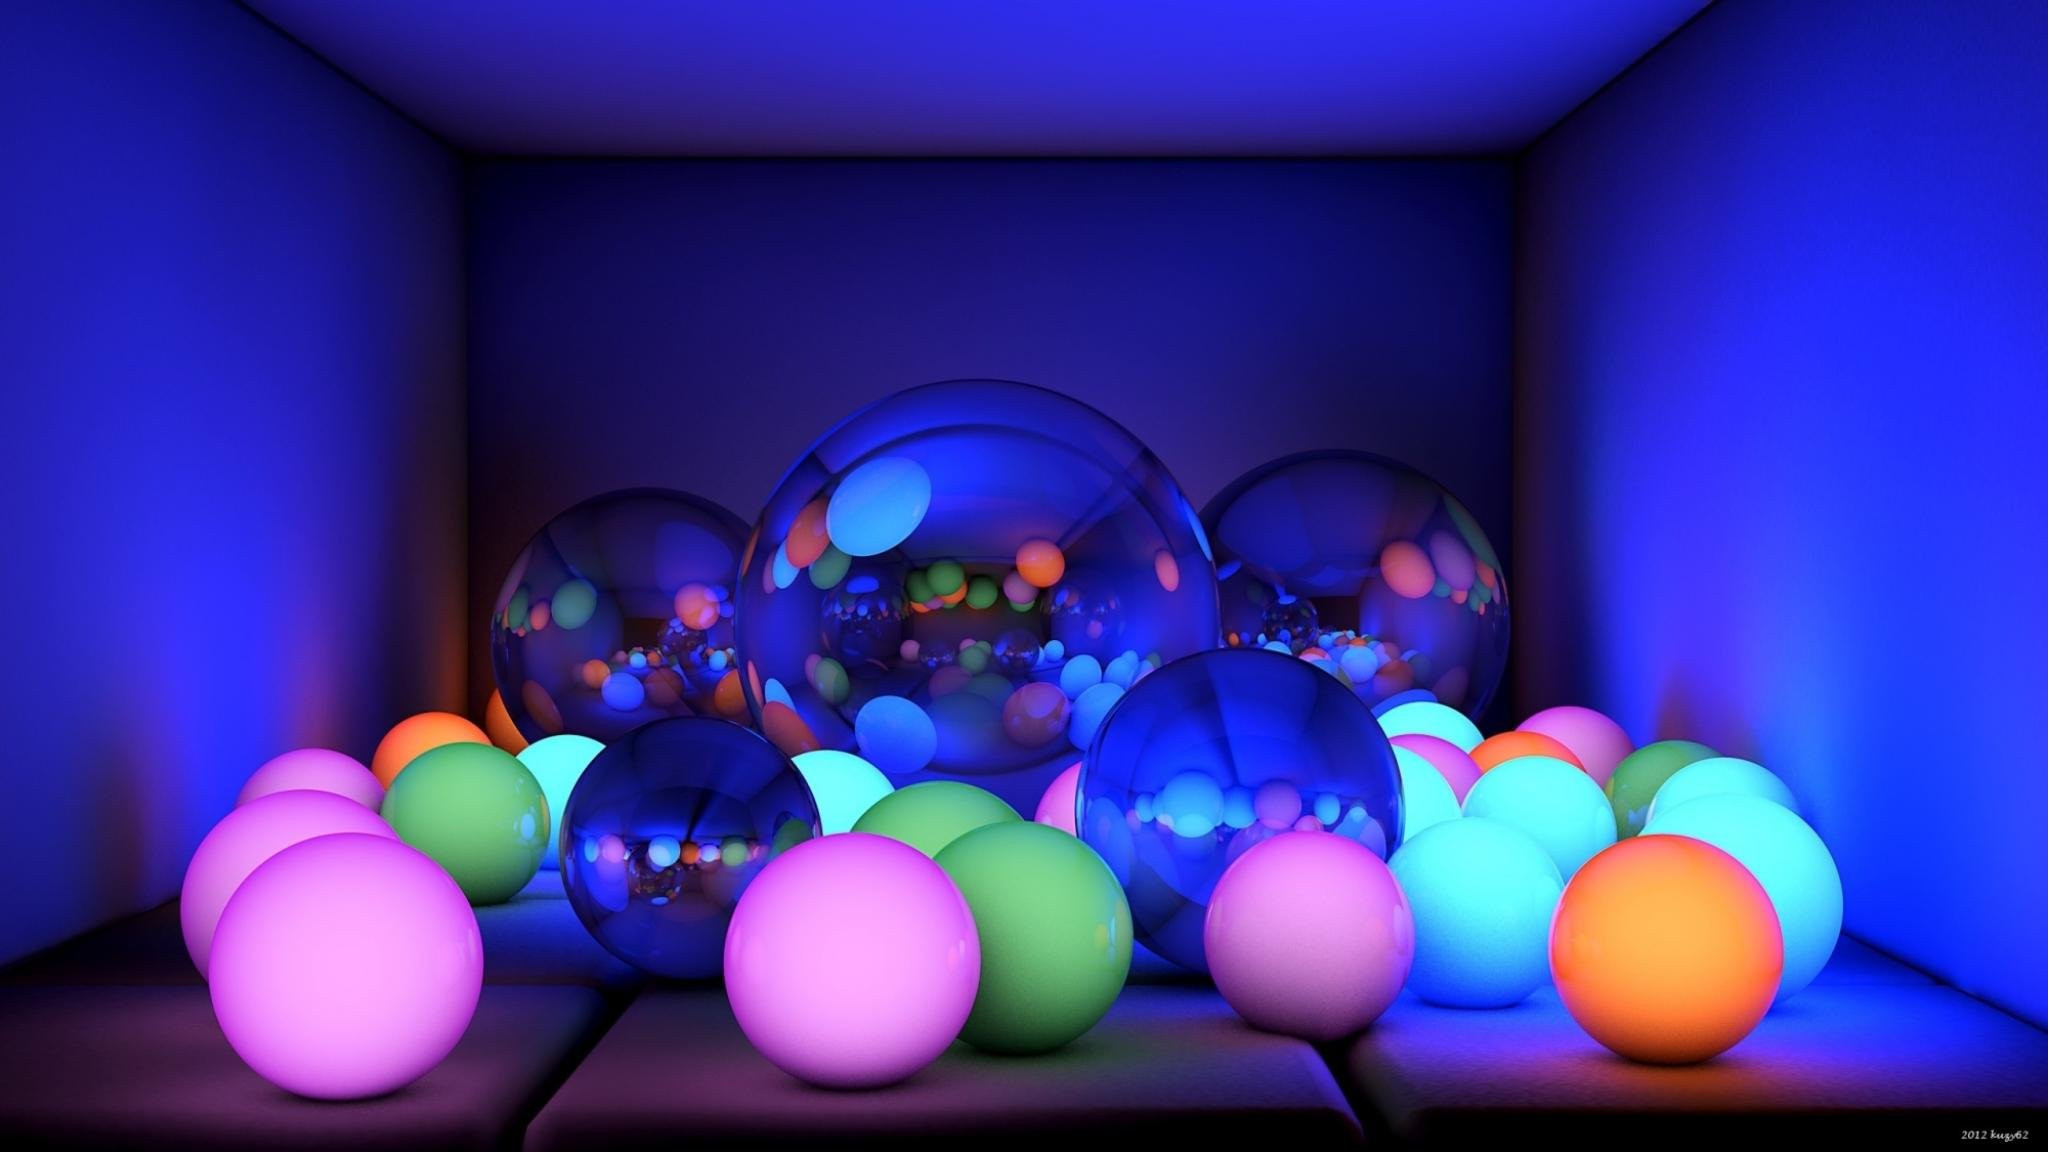 Lightning Ball Free Desktop Wallpapers Cool Size 2560 X 1440 1546871 Hd Wallpaper Backgrounds Download